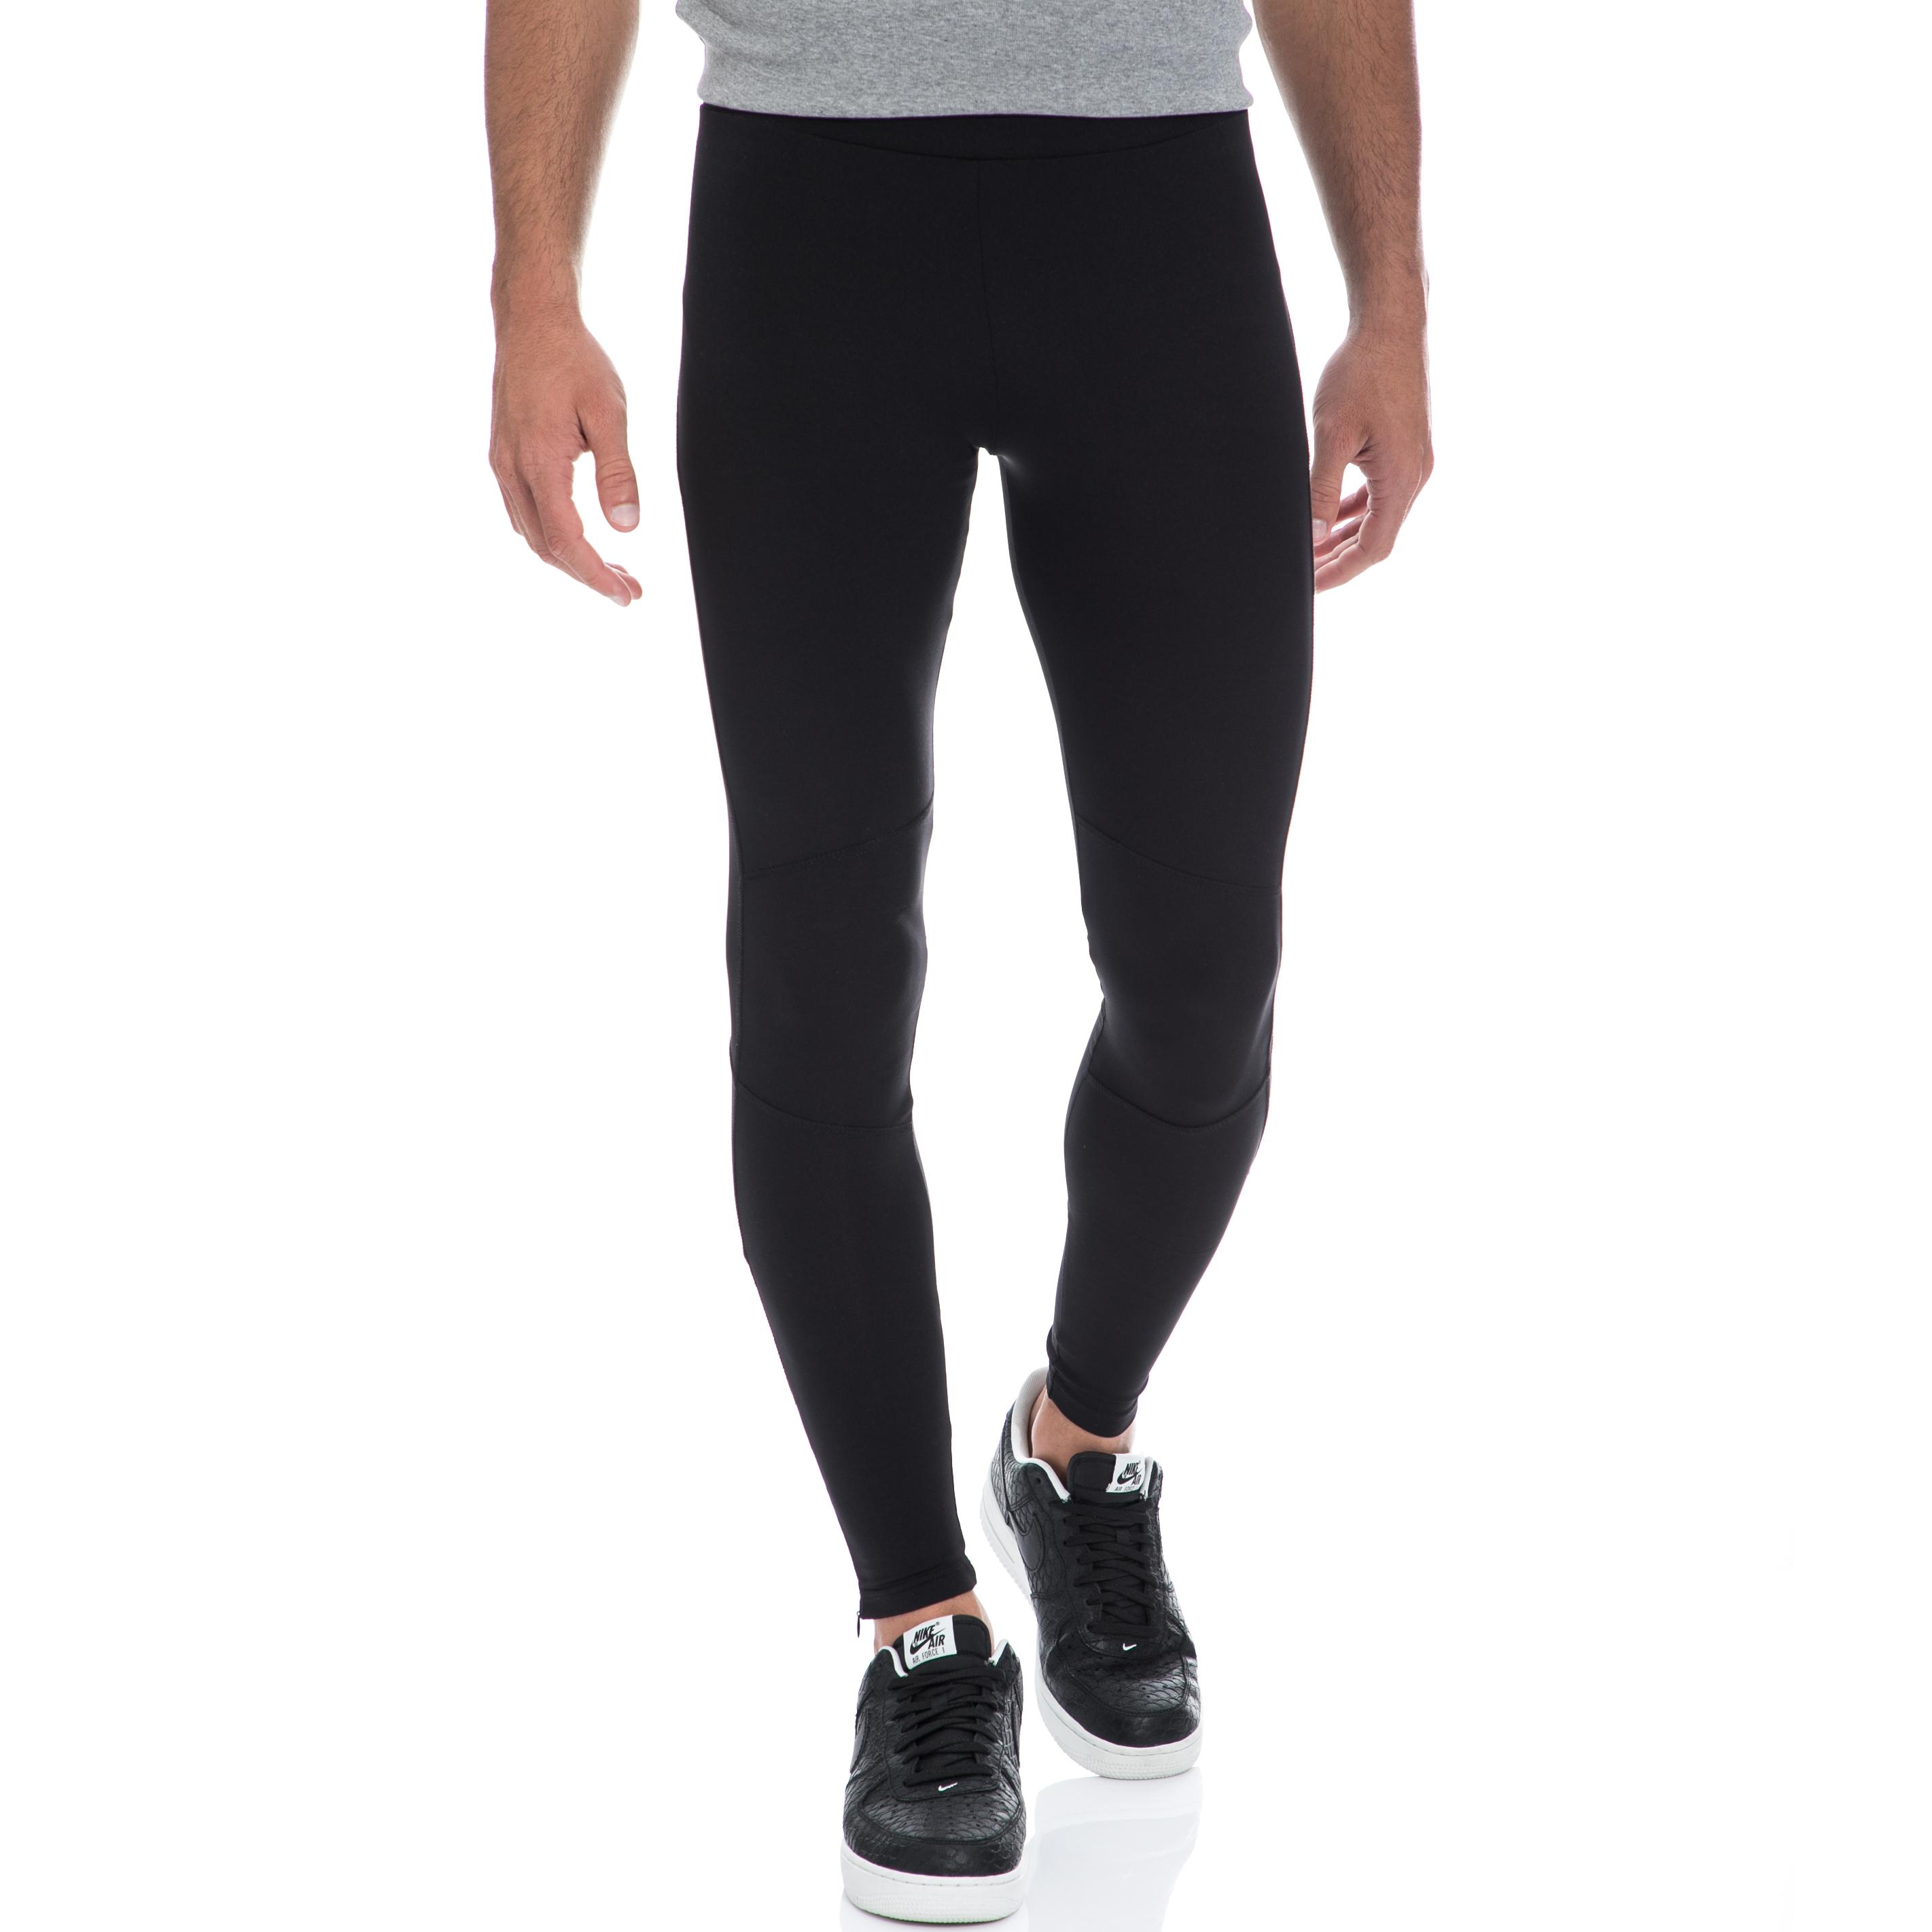 BODYTALK - Ανδρικό κολάν BODYTALK μαύρο ανδρικά ρούχα αθλητικά κολάν